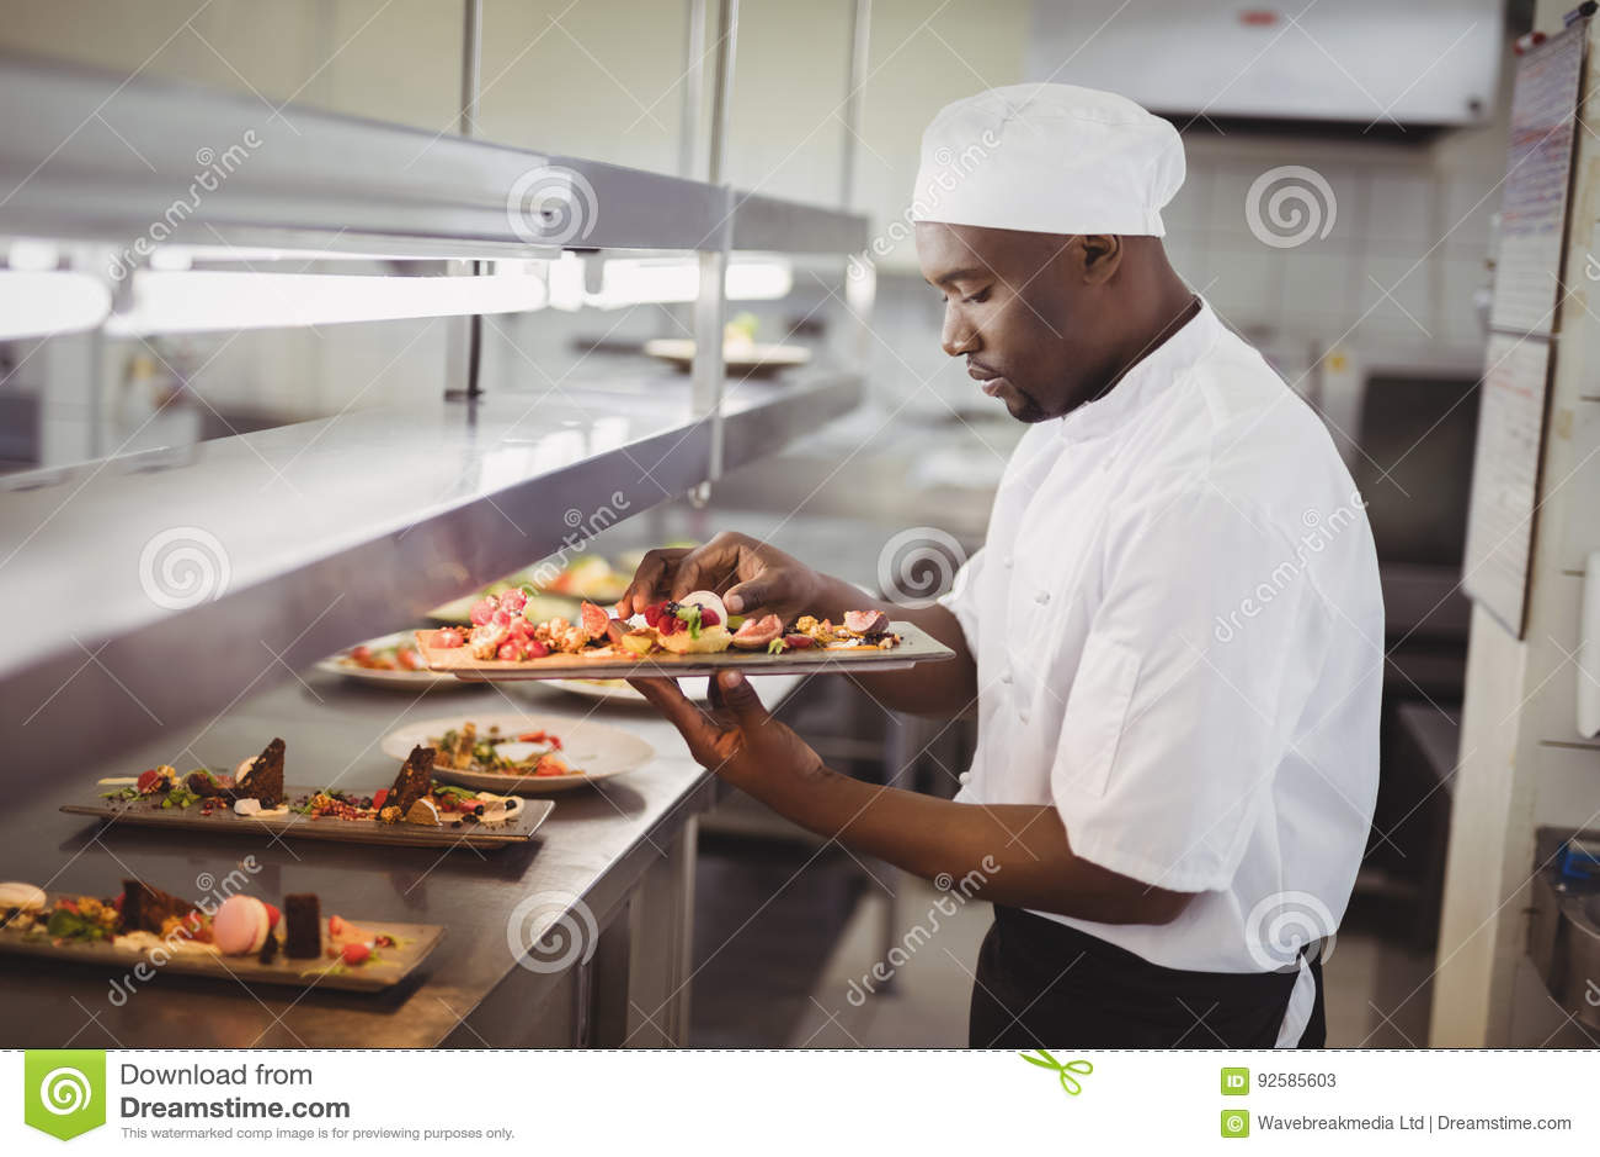 kitchen chef decor best faucets consumer reports 装饰点心的厨师在商业厨房里库存图片 图片包括有户内 并且 工作 装饰点心的厨师在商业厨房里